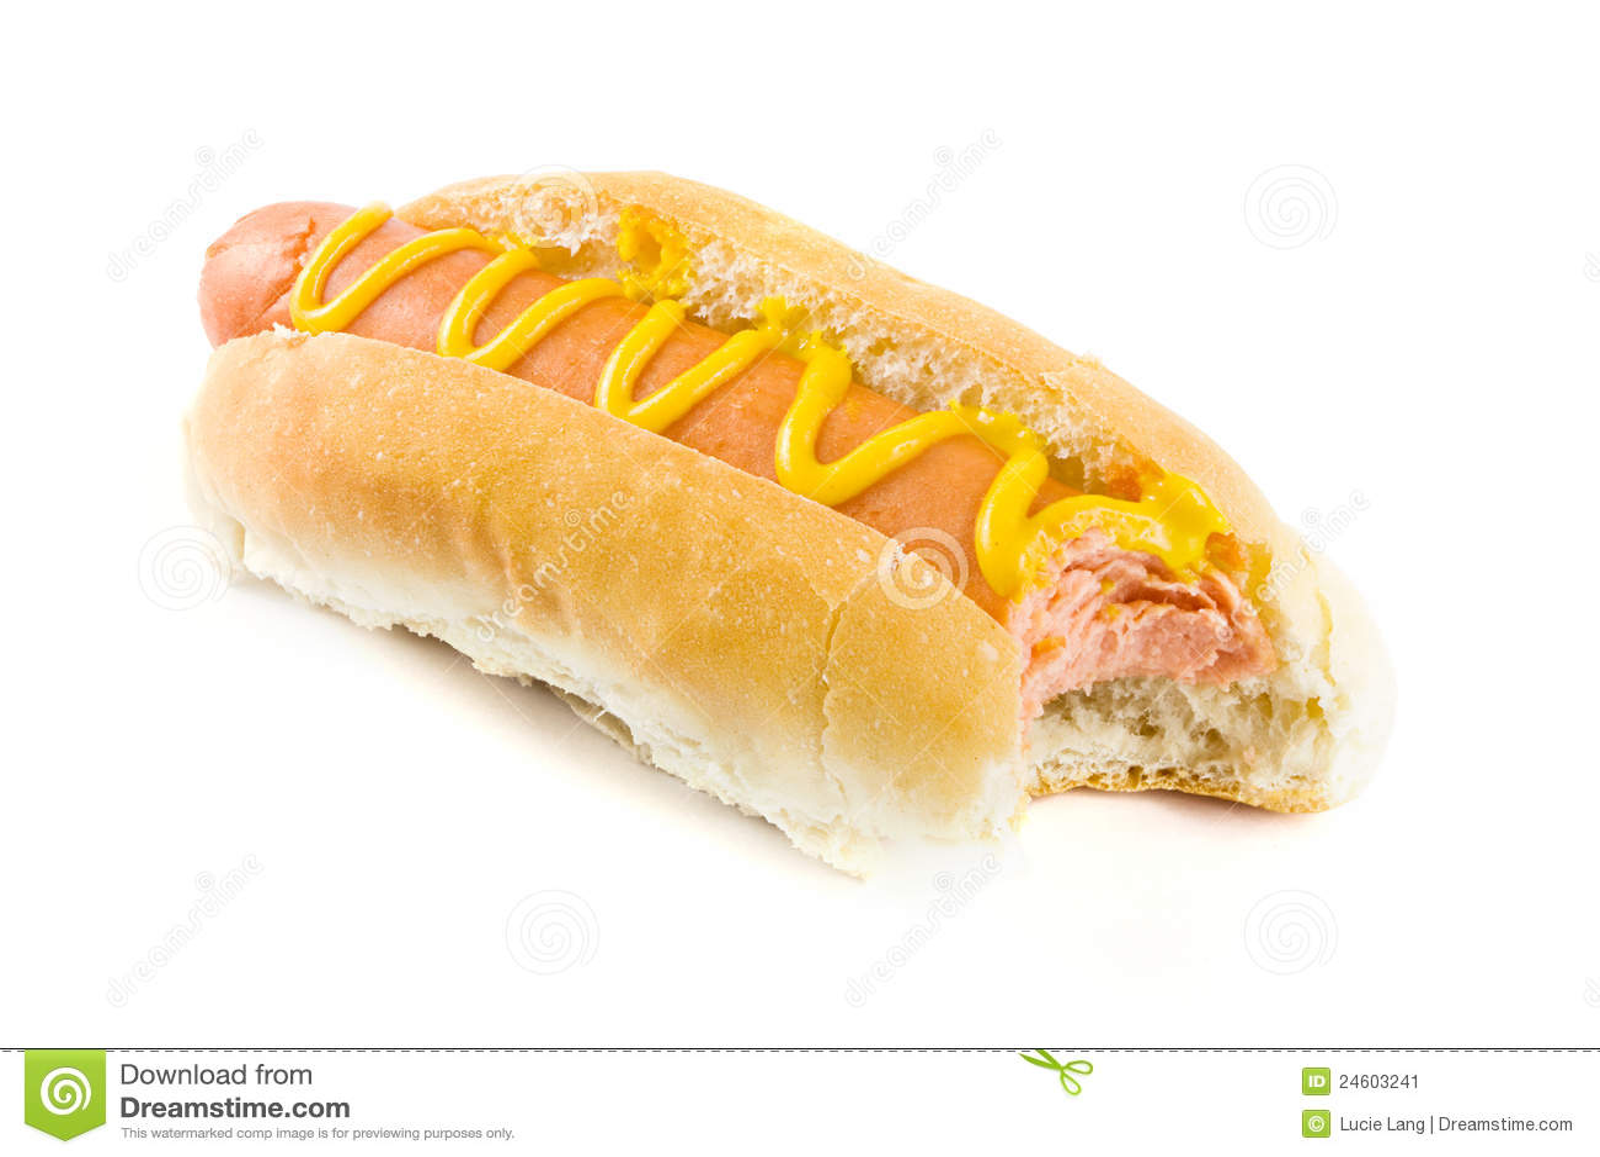 Tasty Bite Hot Dogs